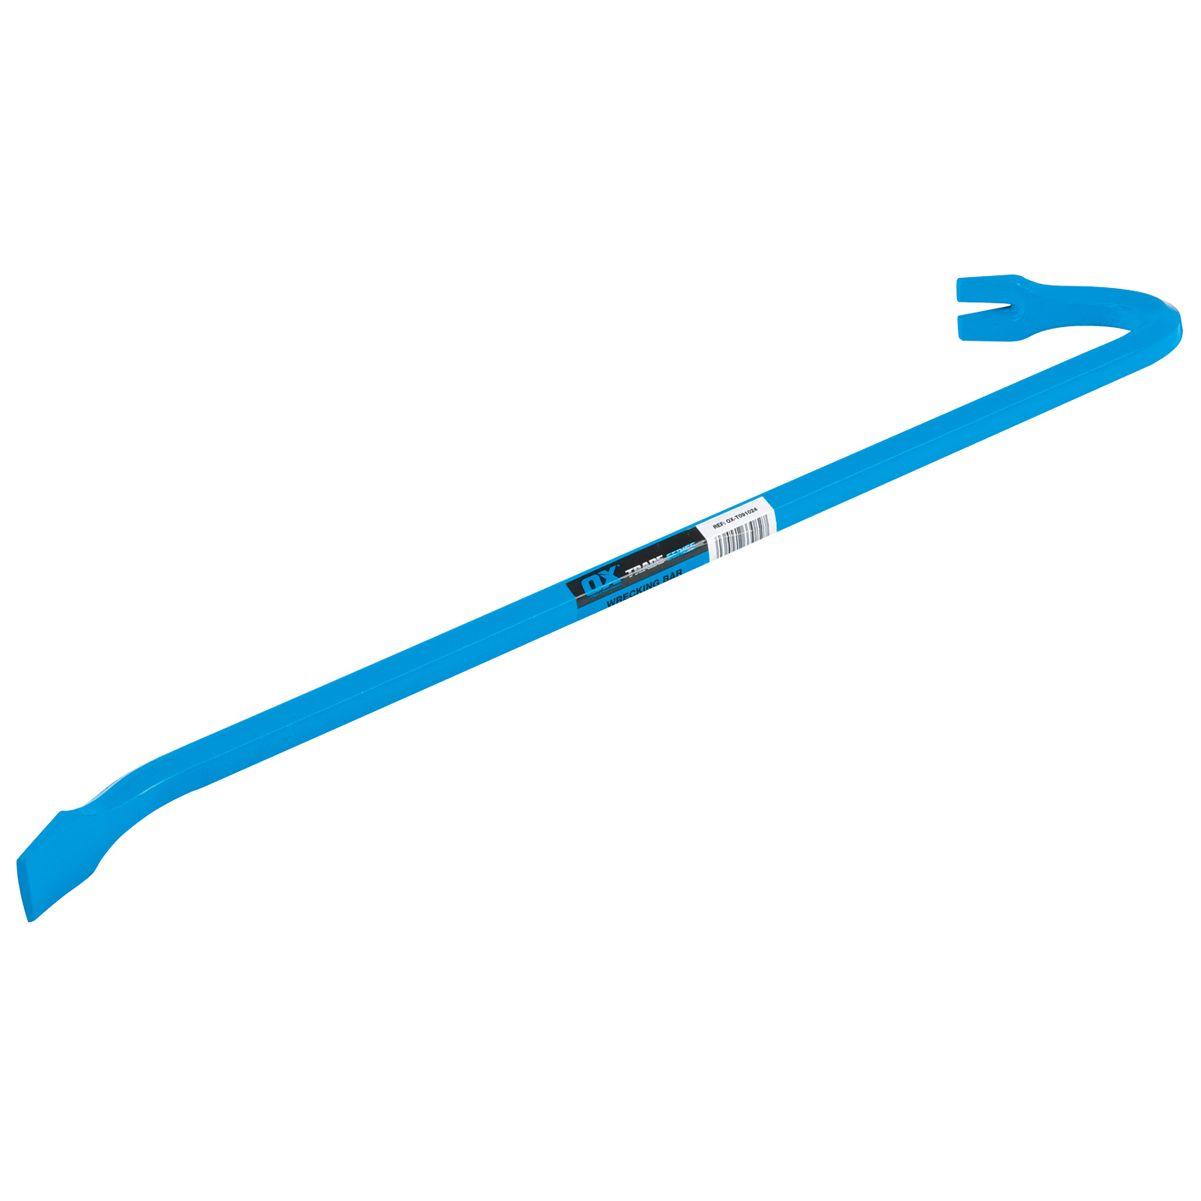 OX Tools Trade Wrecking Bar - 900mm